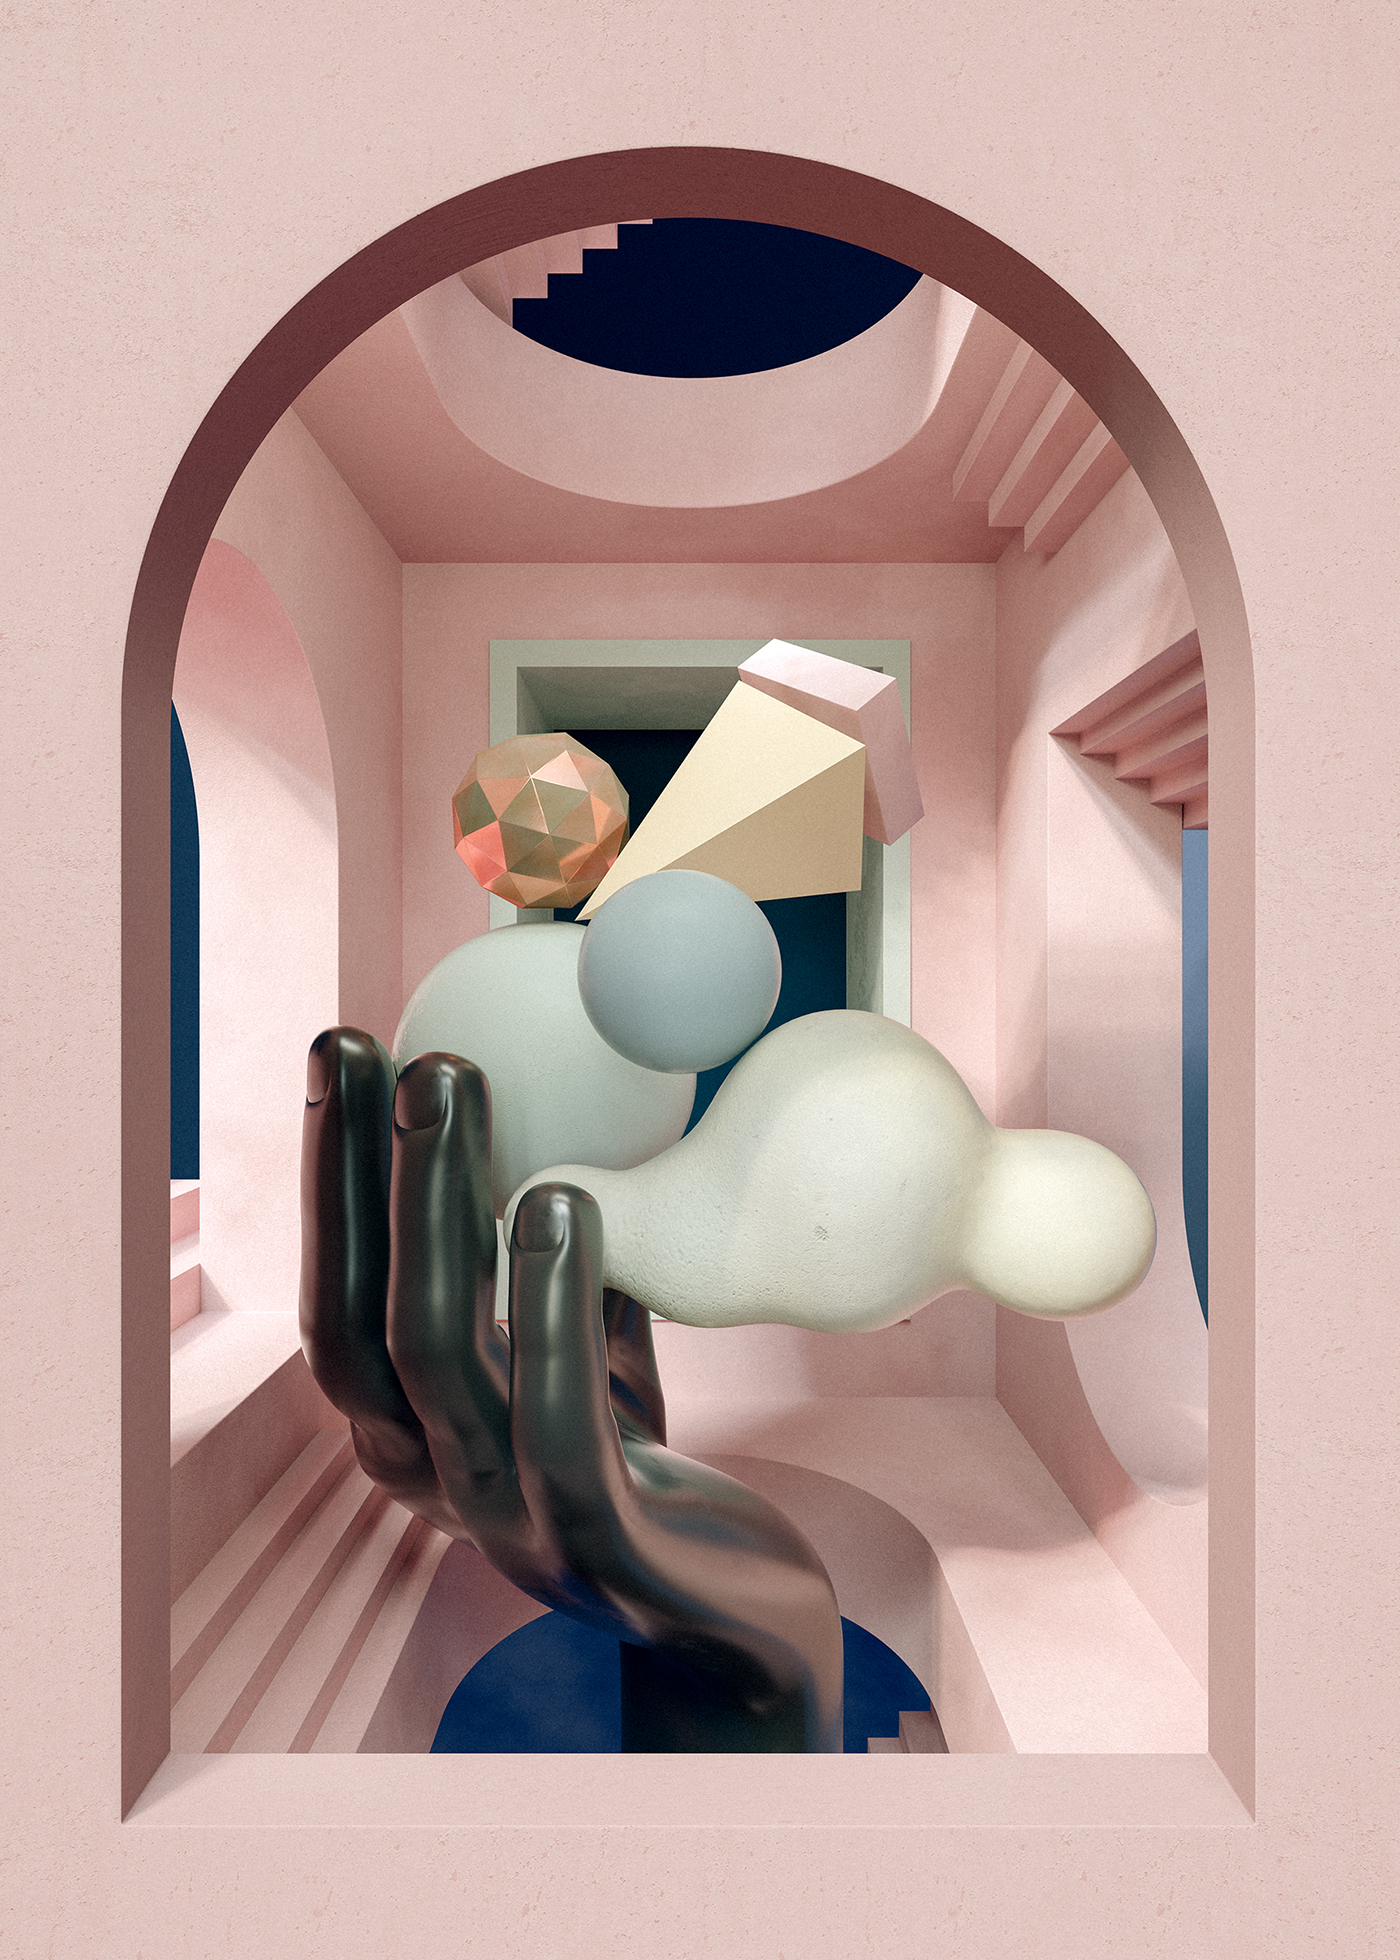 portals 3D design art direction  cinema 4d c4d Digital Art  ILLUSTRATION  Window owe martirez